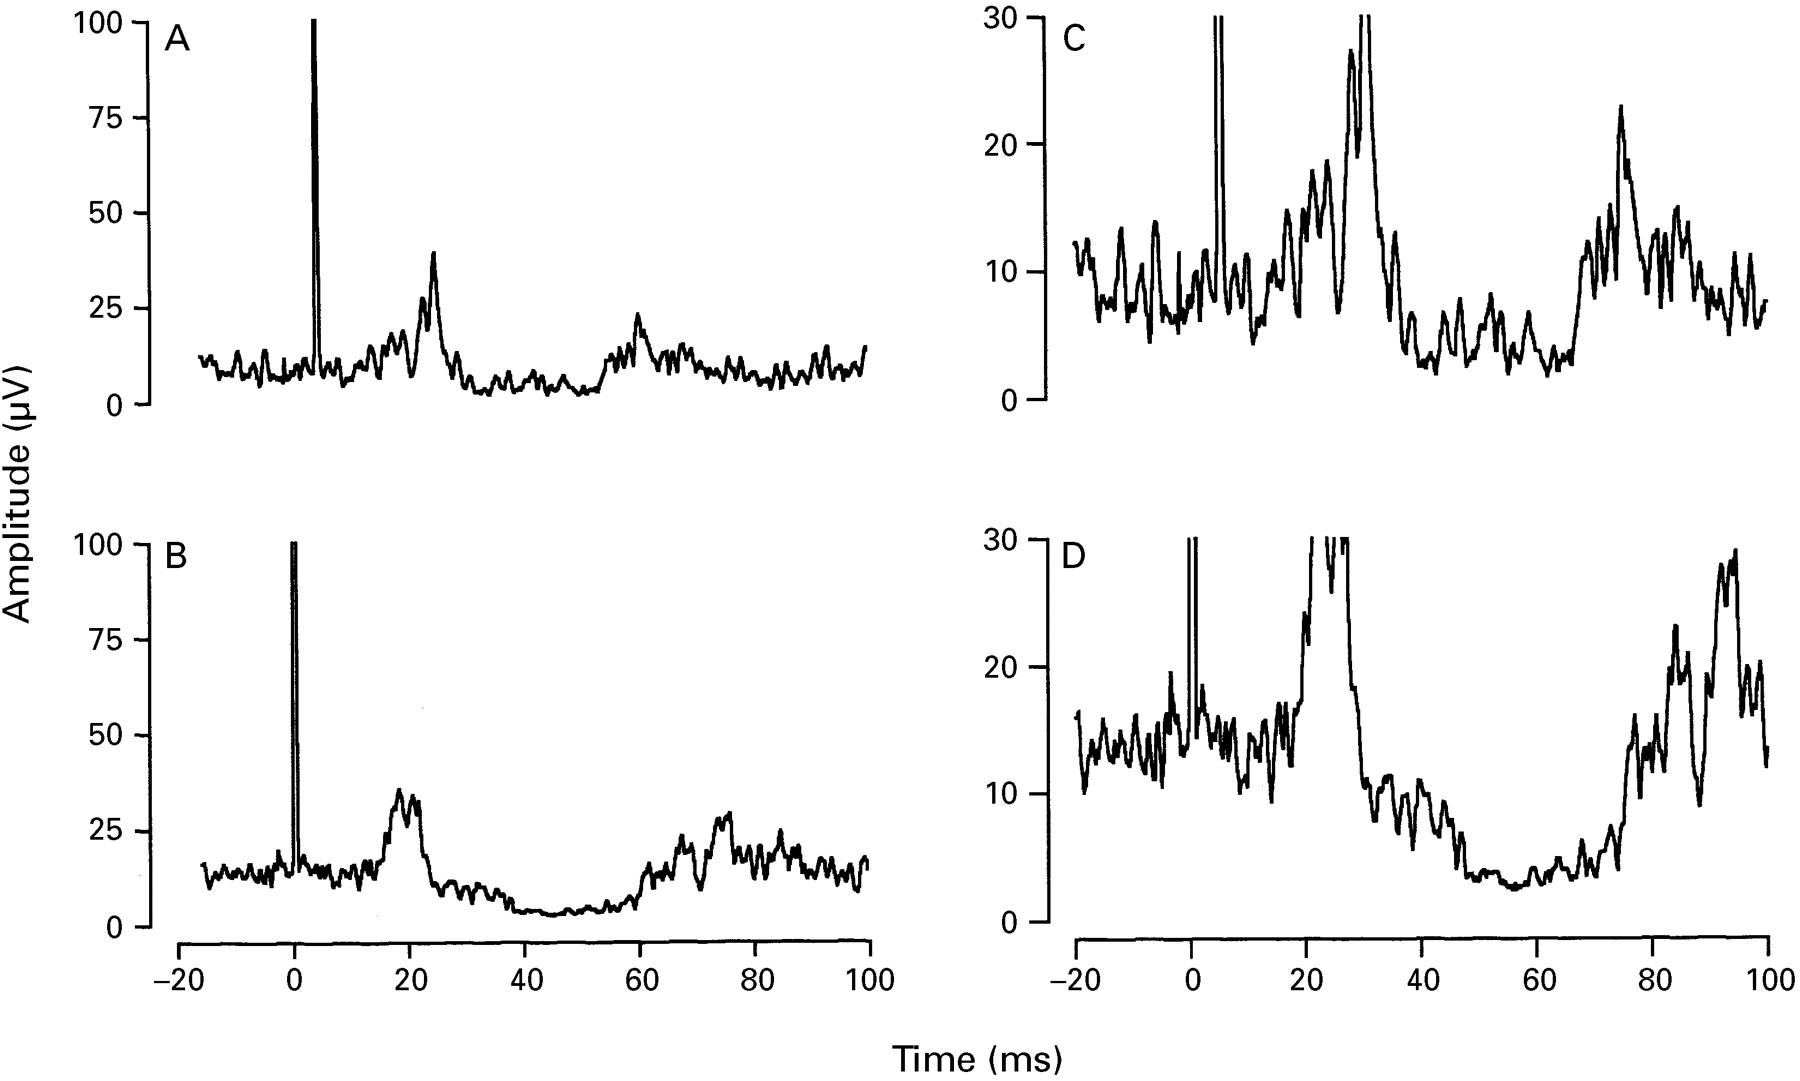 Effects of antipsychotic medication on electromyographic